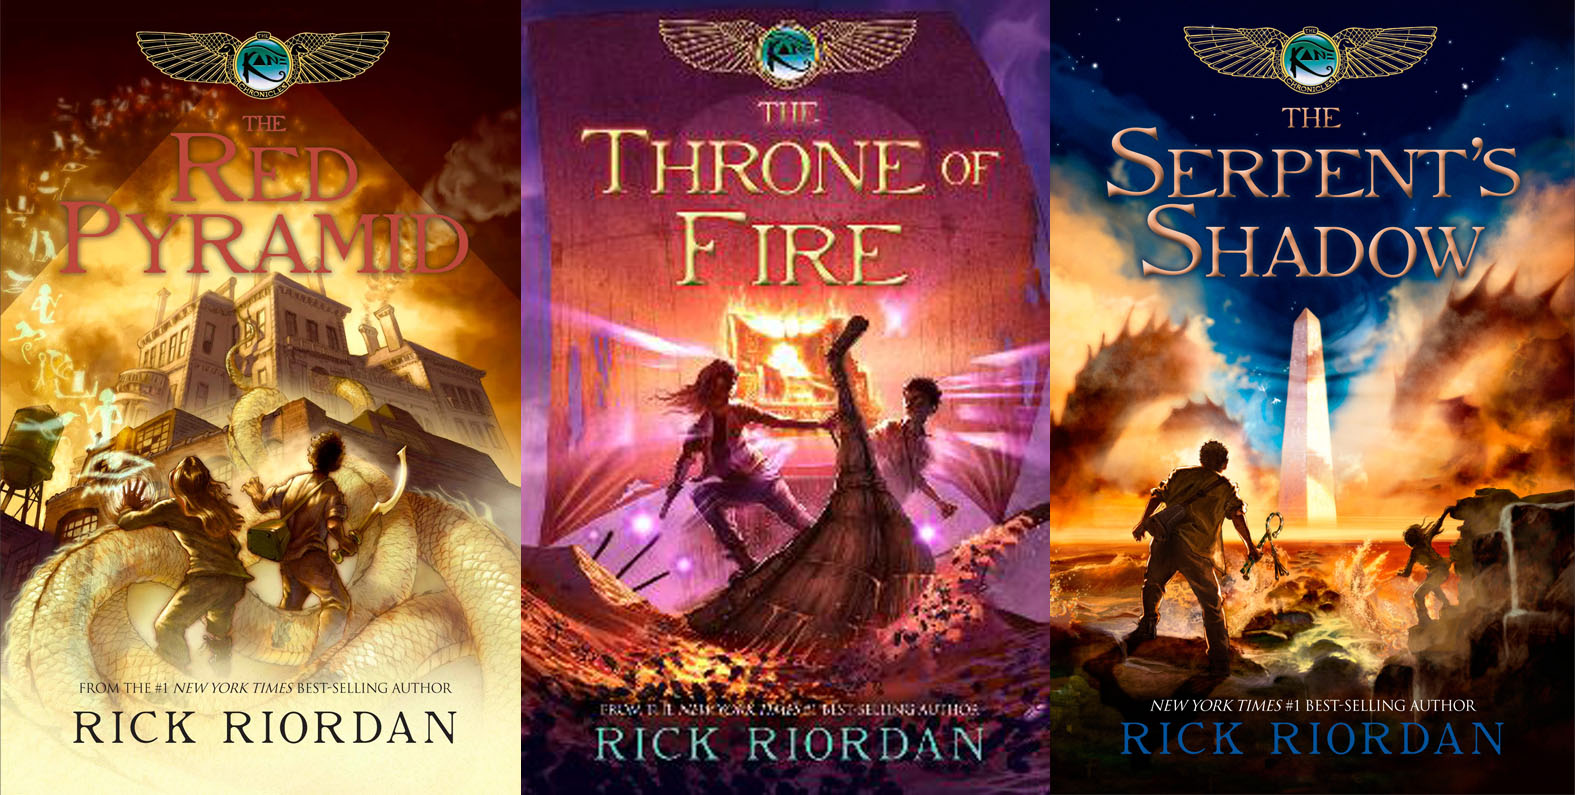 Review: The Kane Chronicles by Rick Riordan – Heart Full of Books